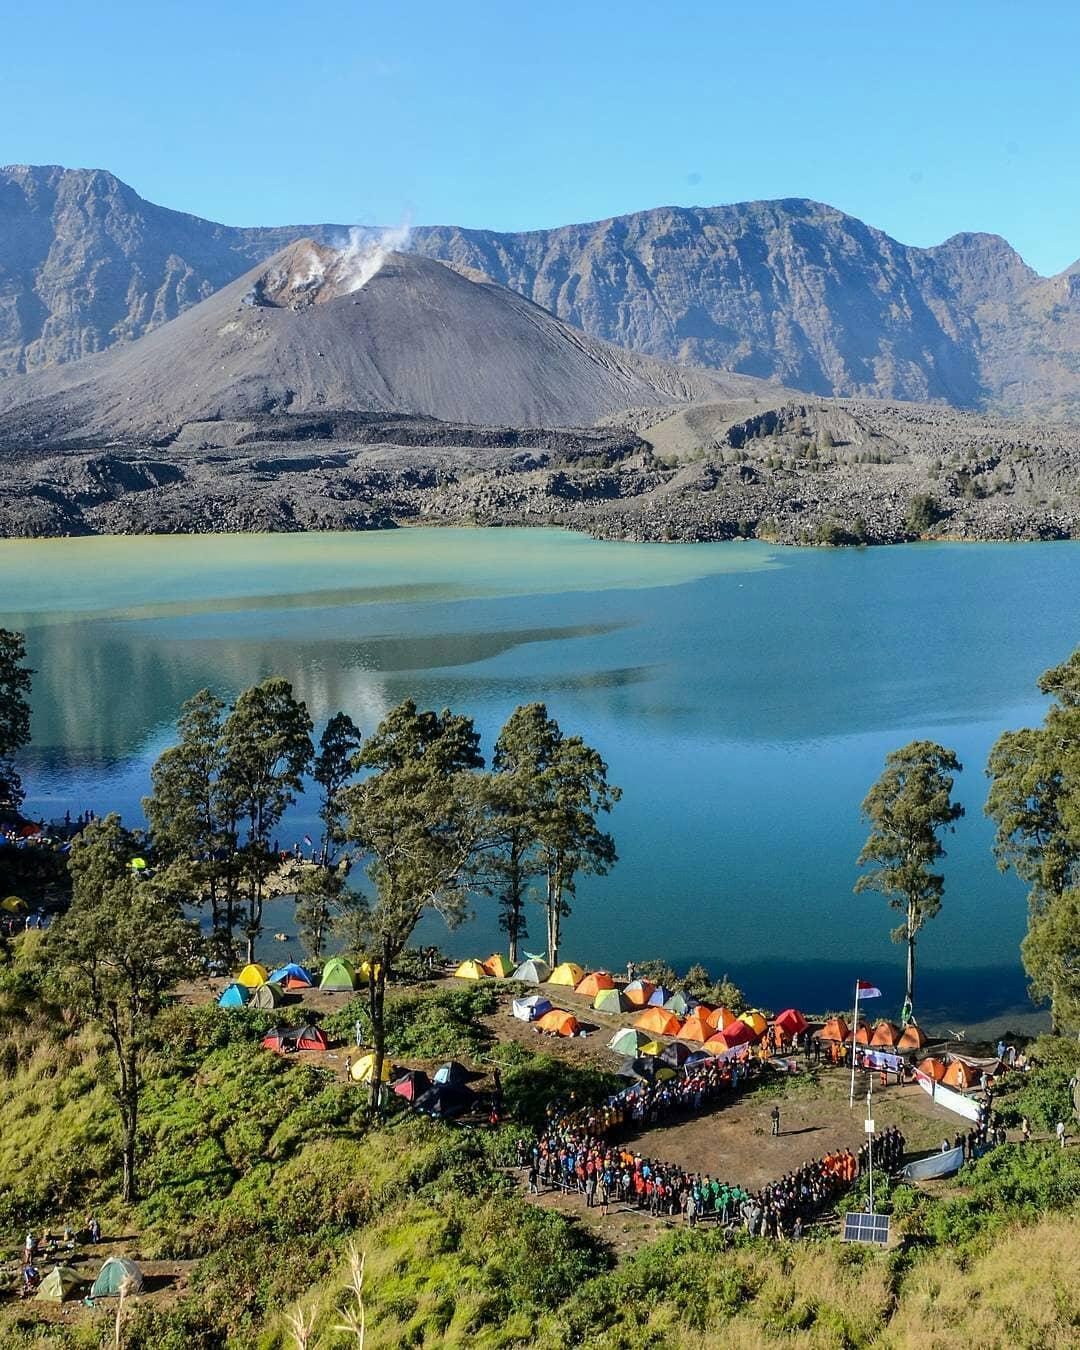 Estimasi biaya pendakian gunung Rinjani via darat